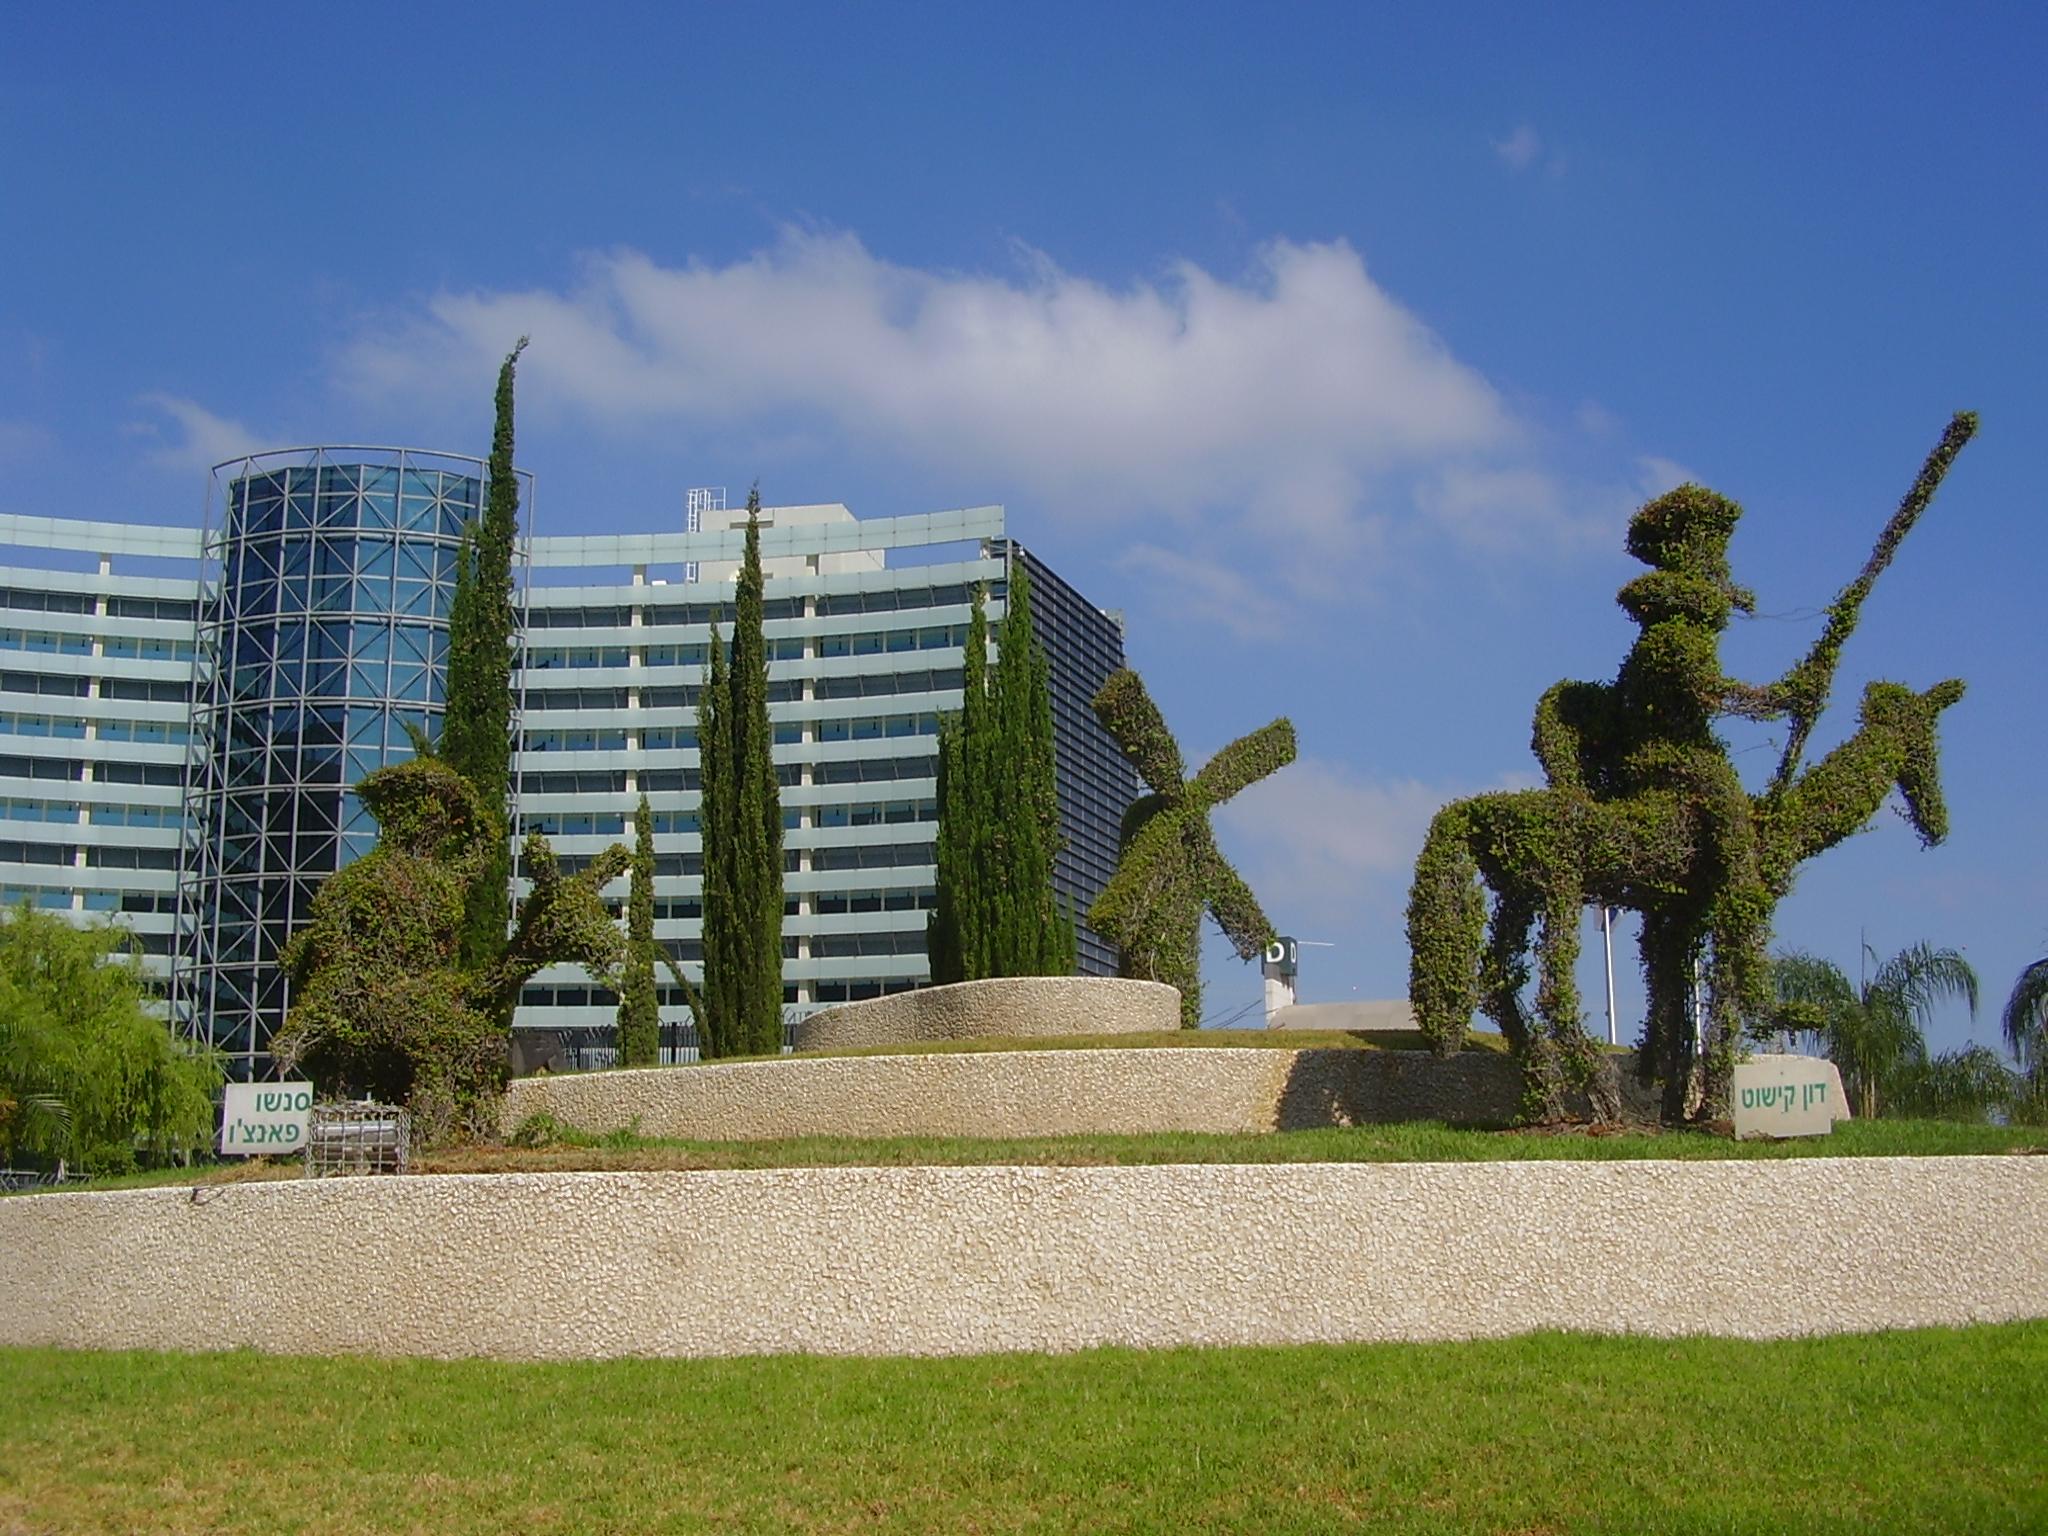 Filepikiwiki israel 20304 azorim park petah tikvag wikimedia filepikiwiki israel 20304 azorim park petah tikvag thecheapjerseys Gallery